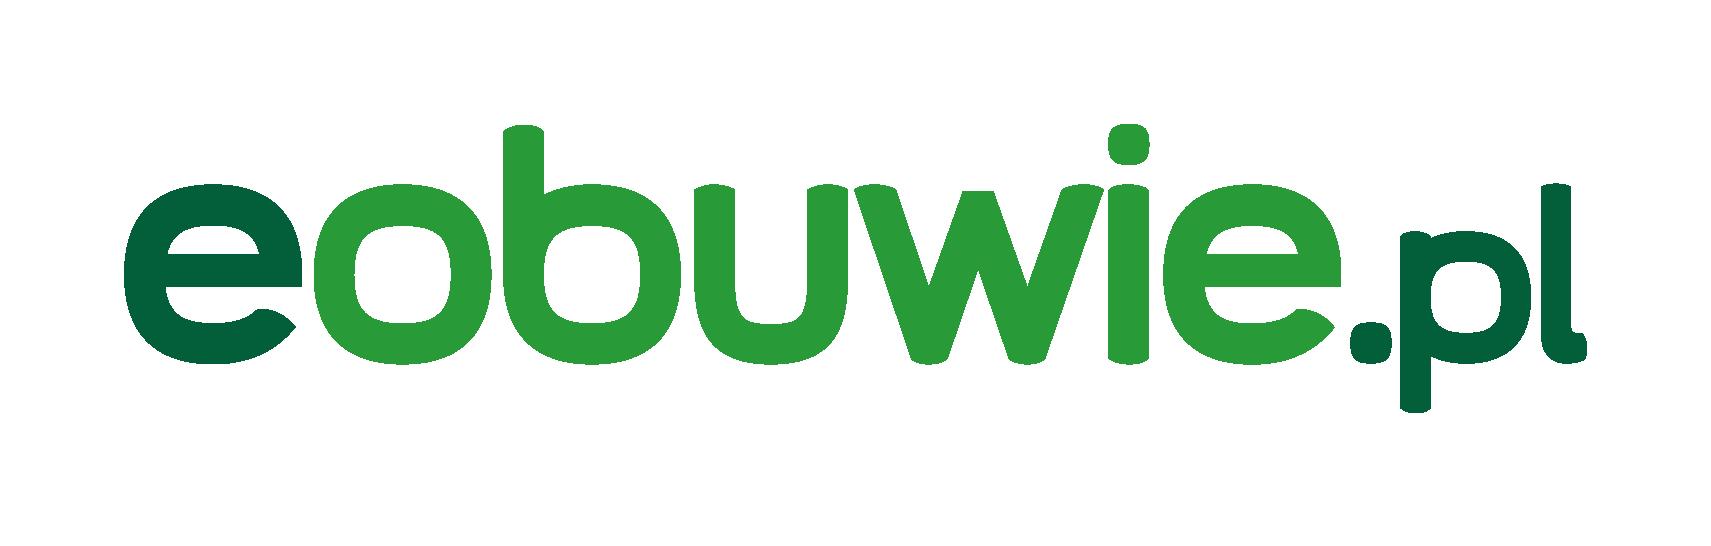 Biuro Prasowe eobuwie.pl SA logo